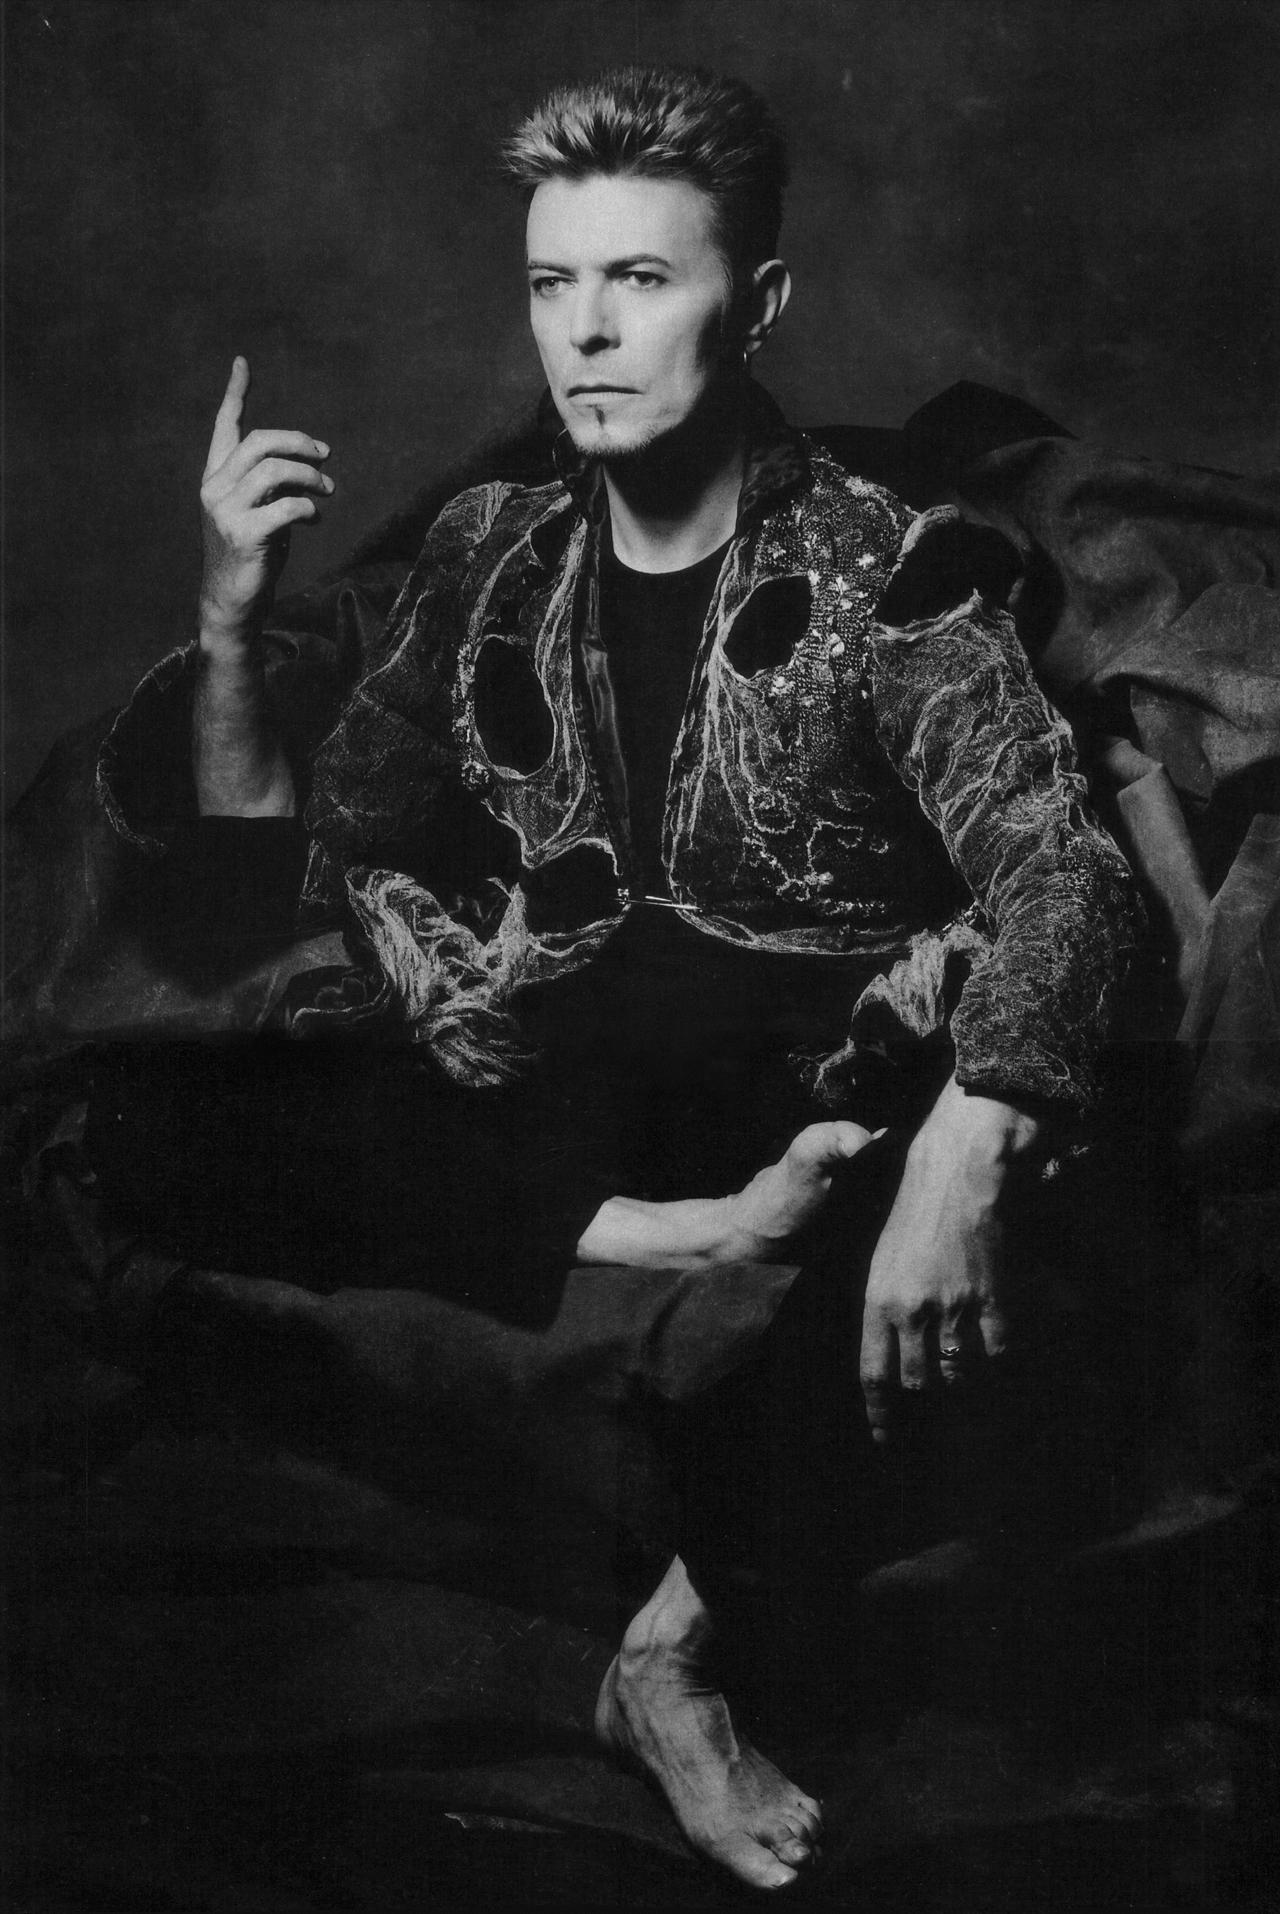 David Bowie 22